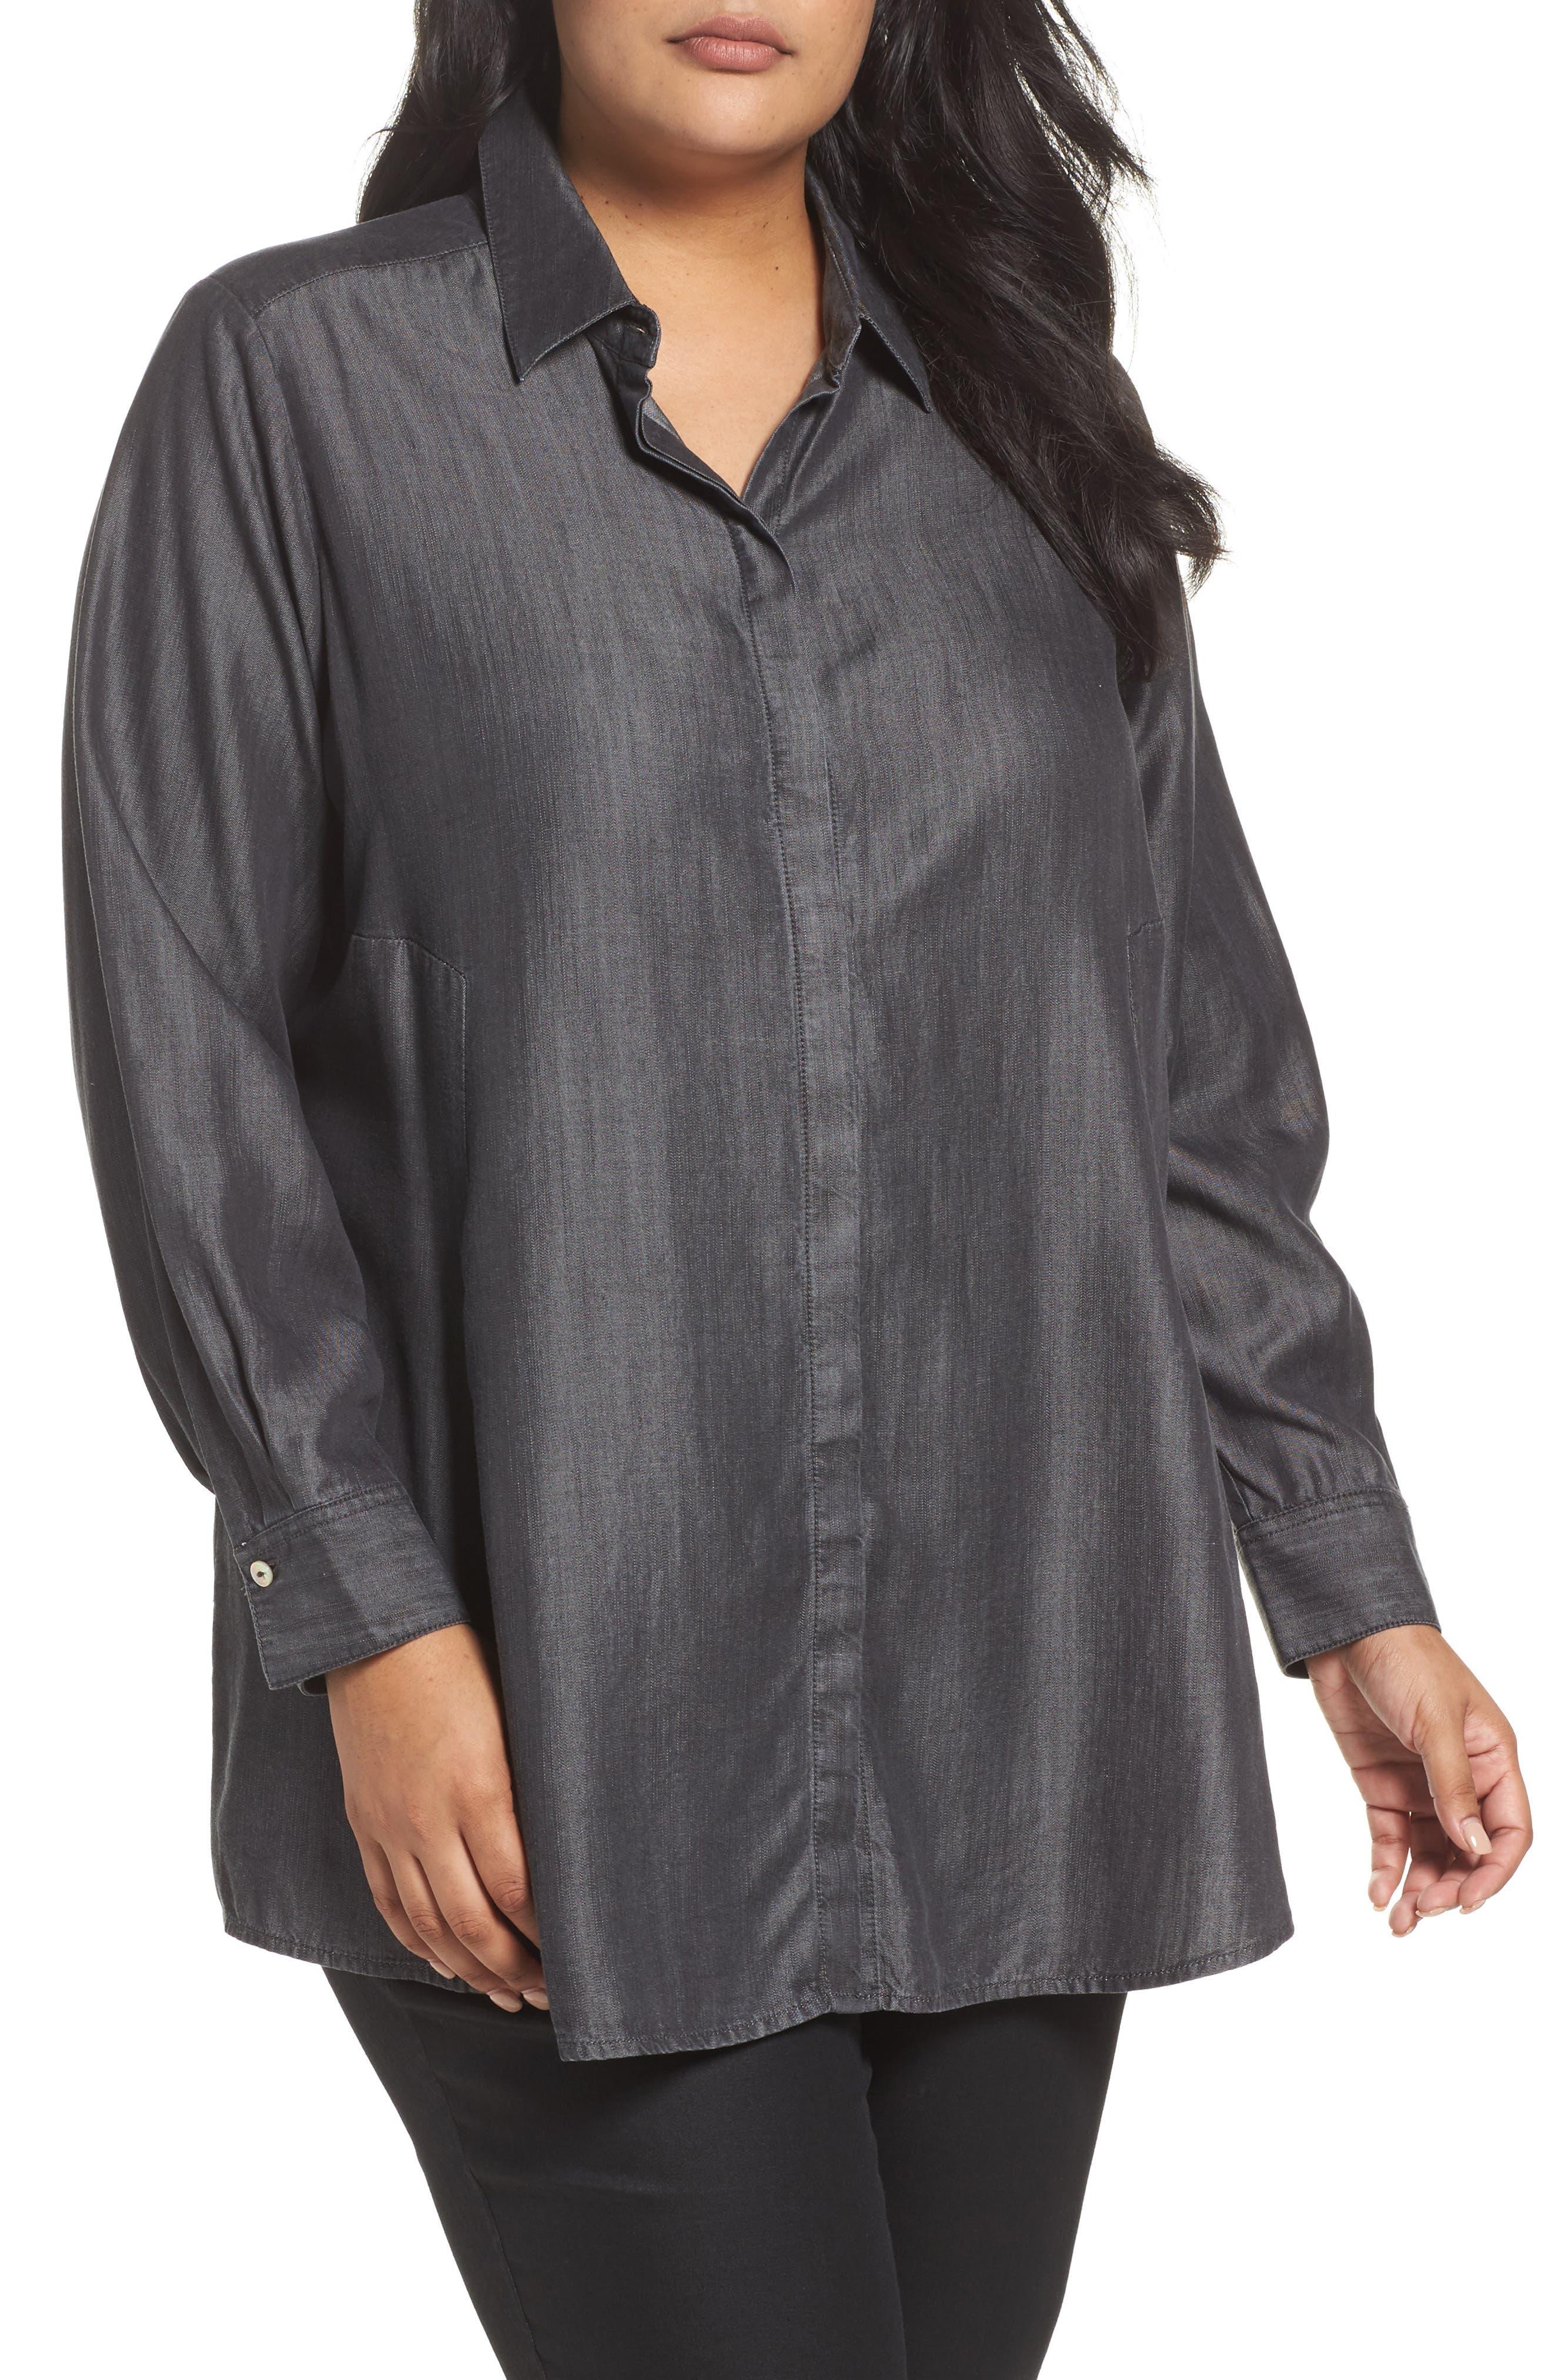 Alternate Image 1 Selected - Foxcroft Chambray Tunic (Plus Size)